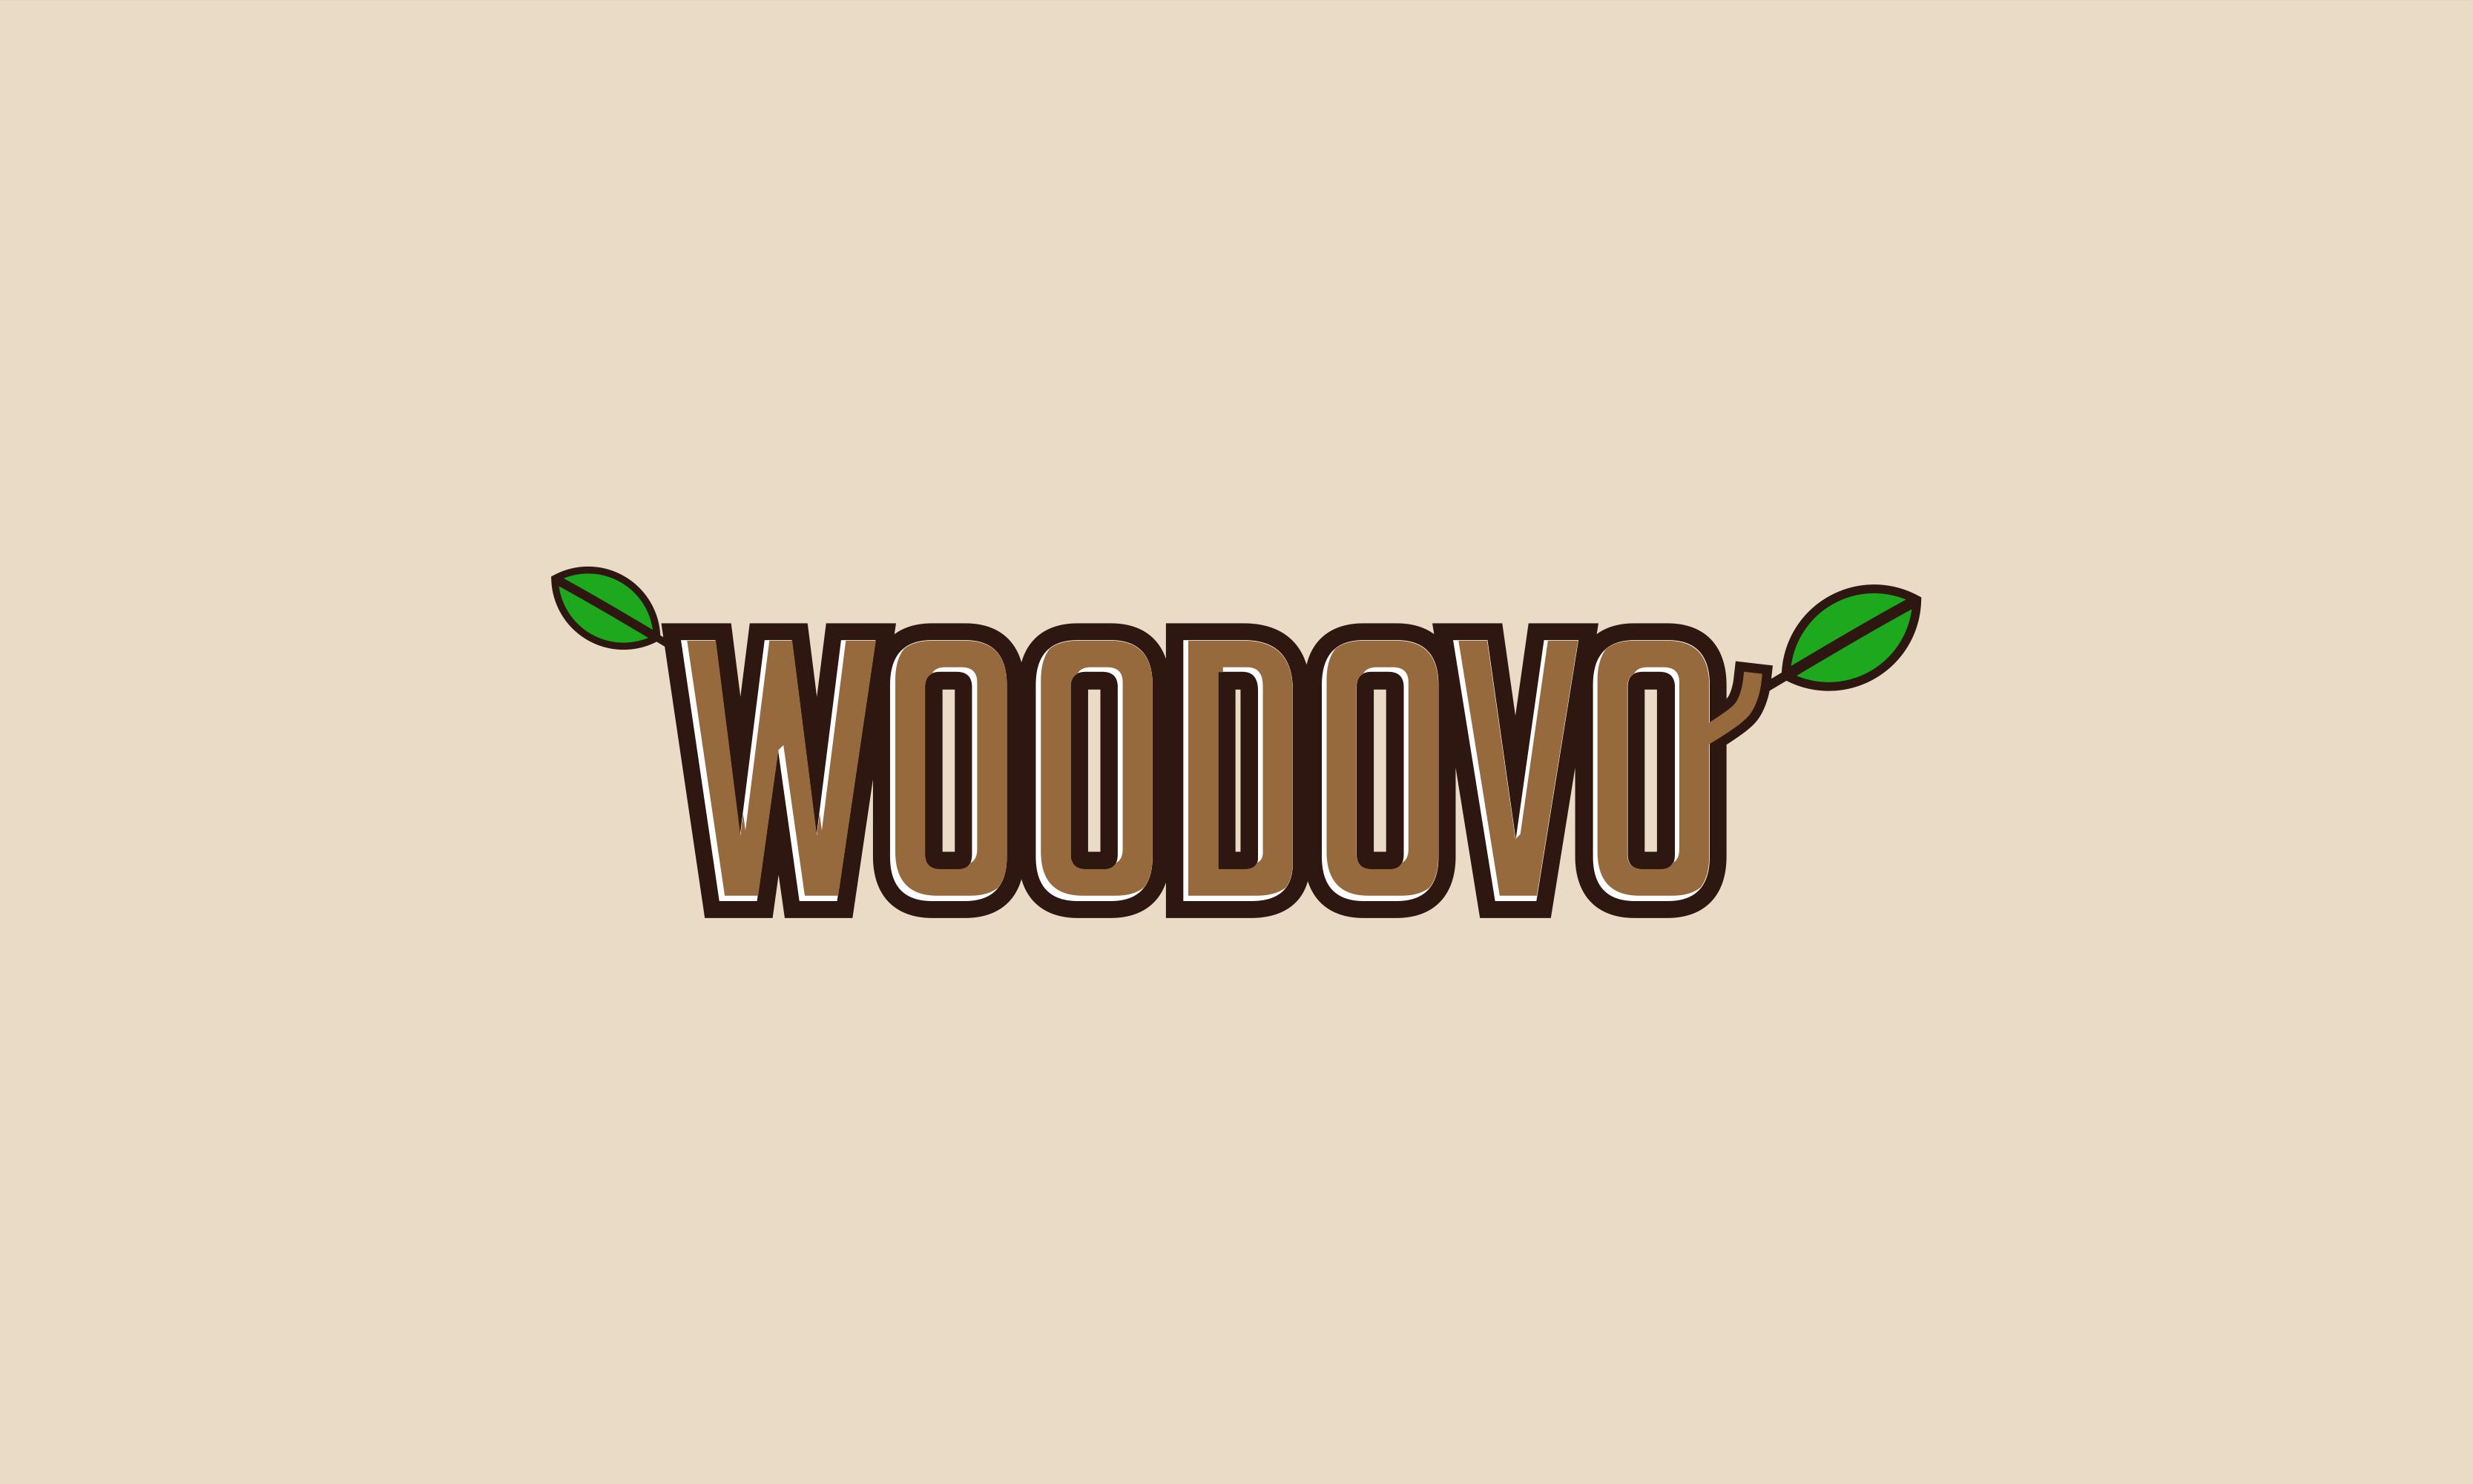 Woodovo